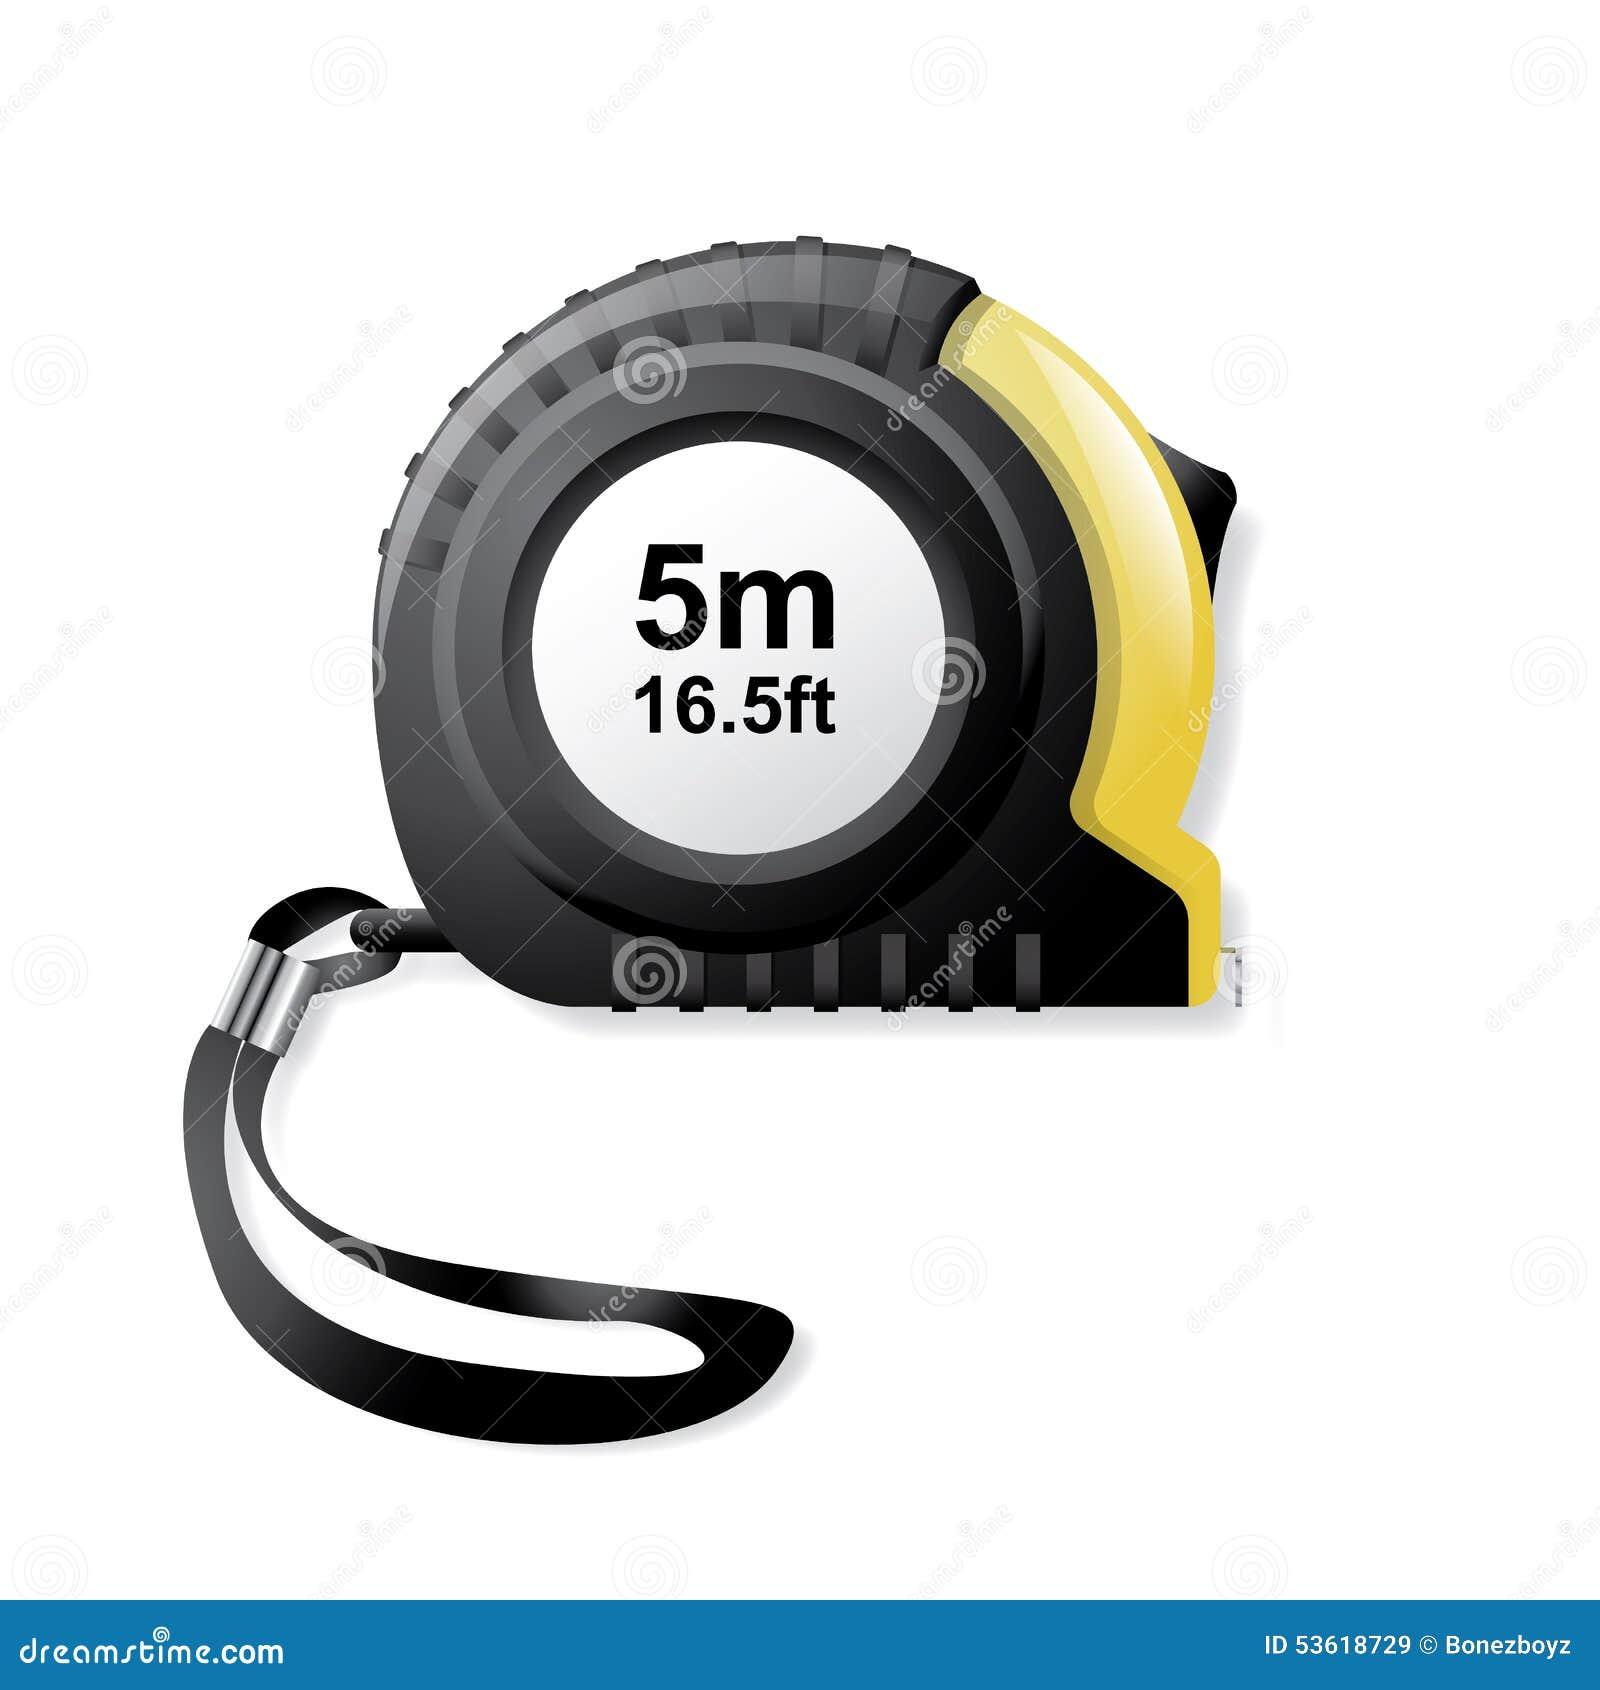 Tape Measure - Vector Illustration Stock Vector - Image ...